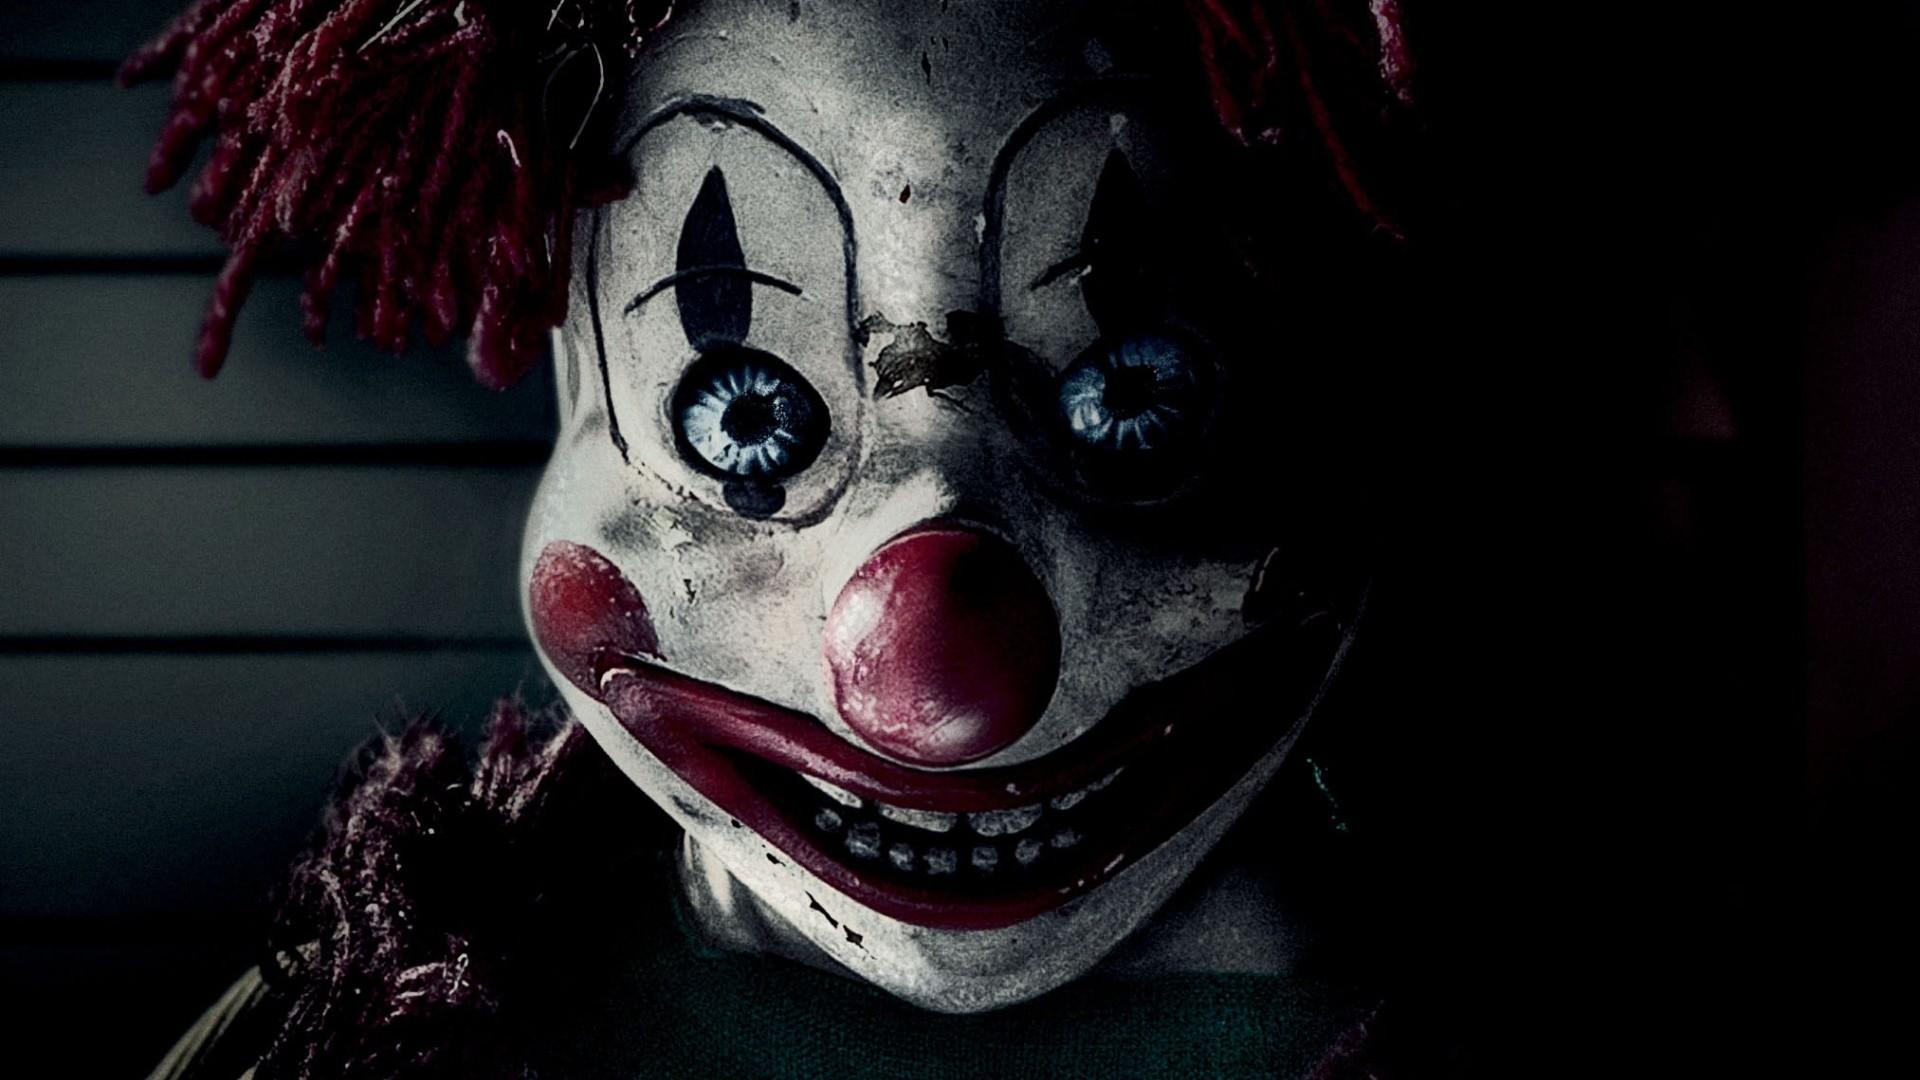 killer clown wallpaper (64+ images)